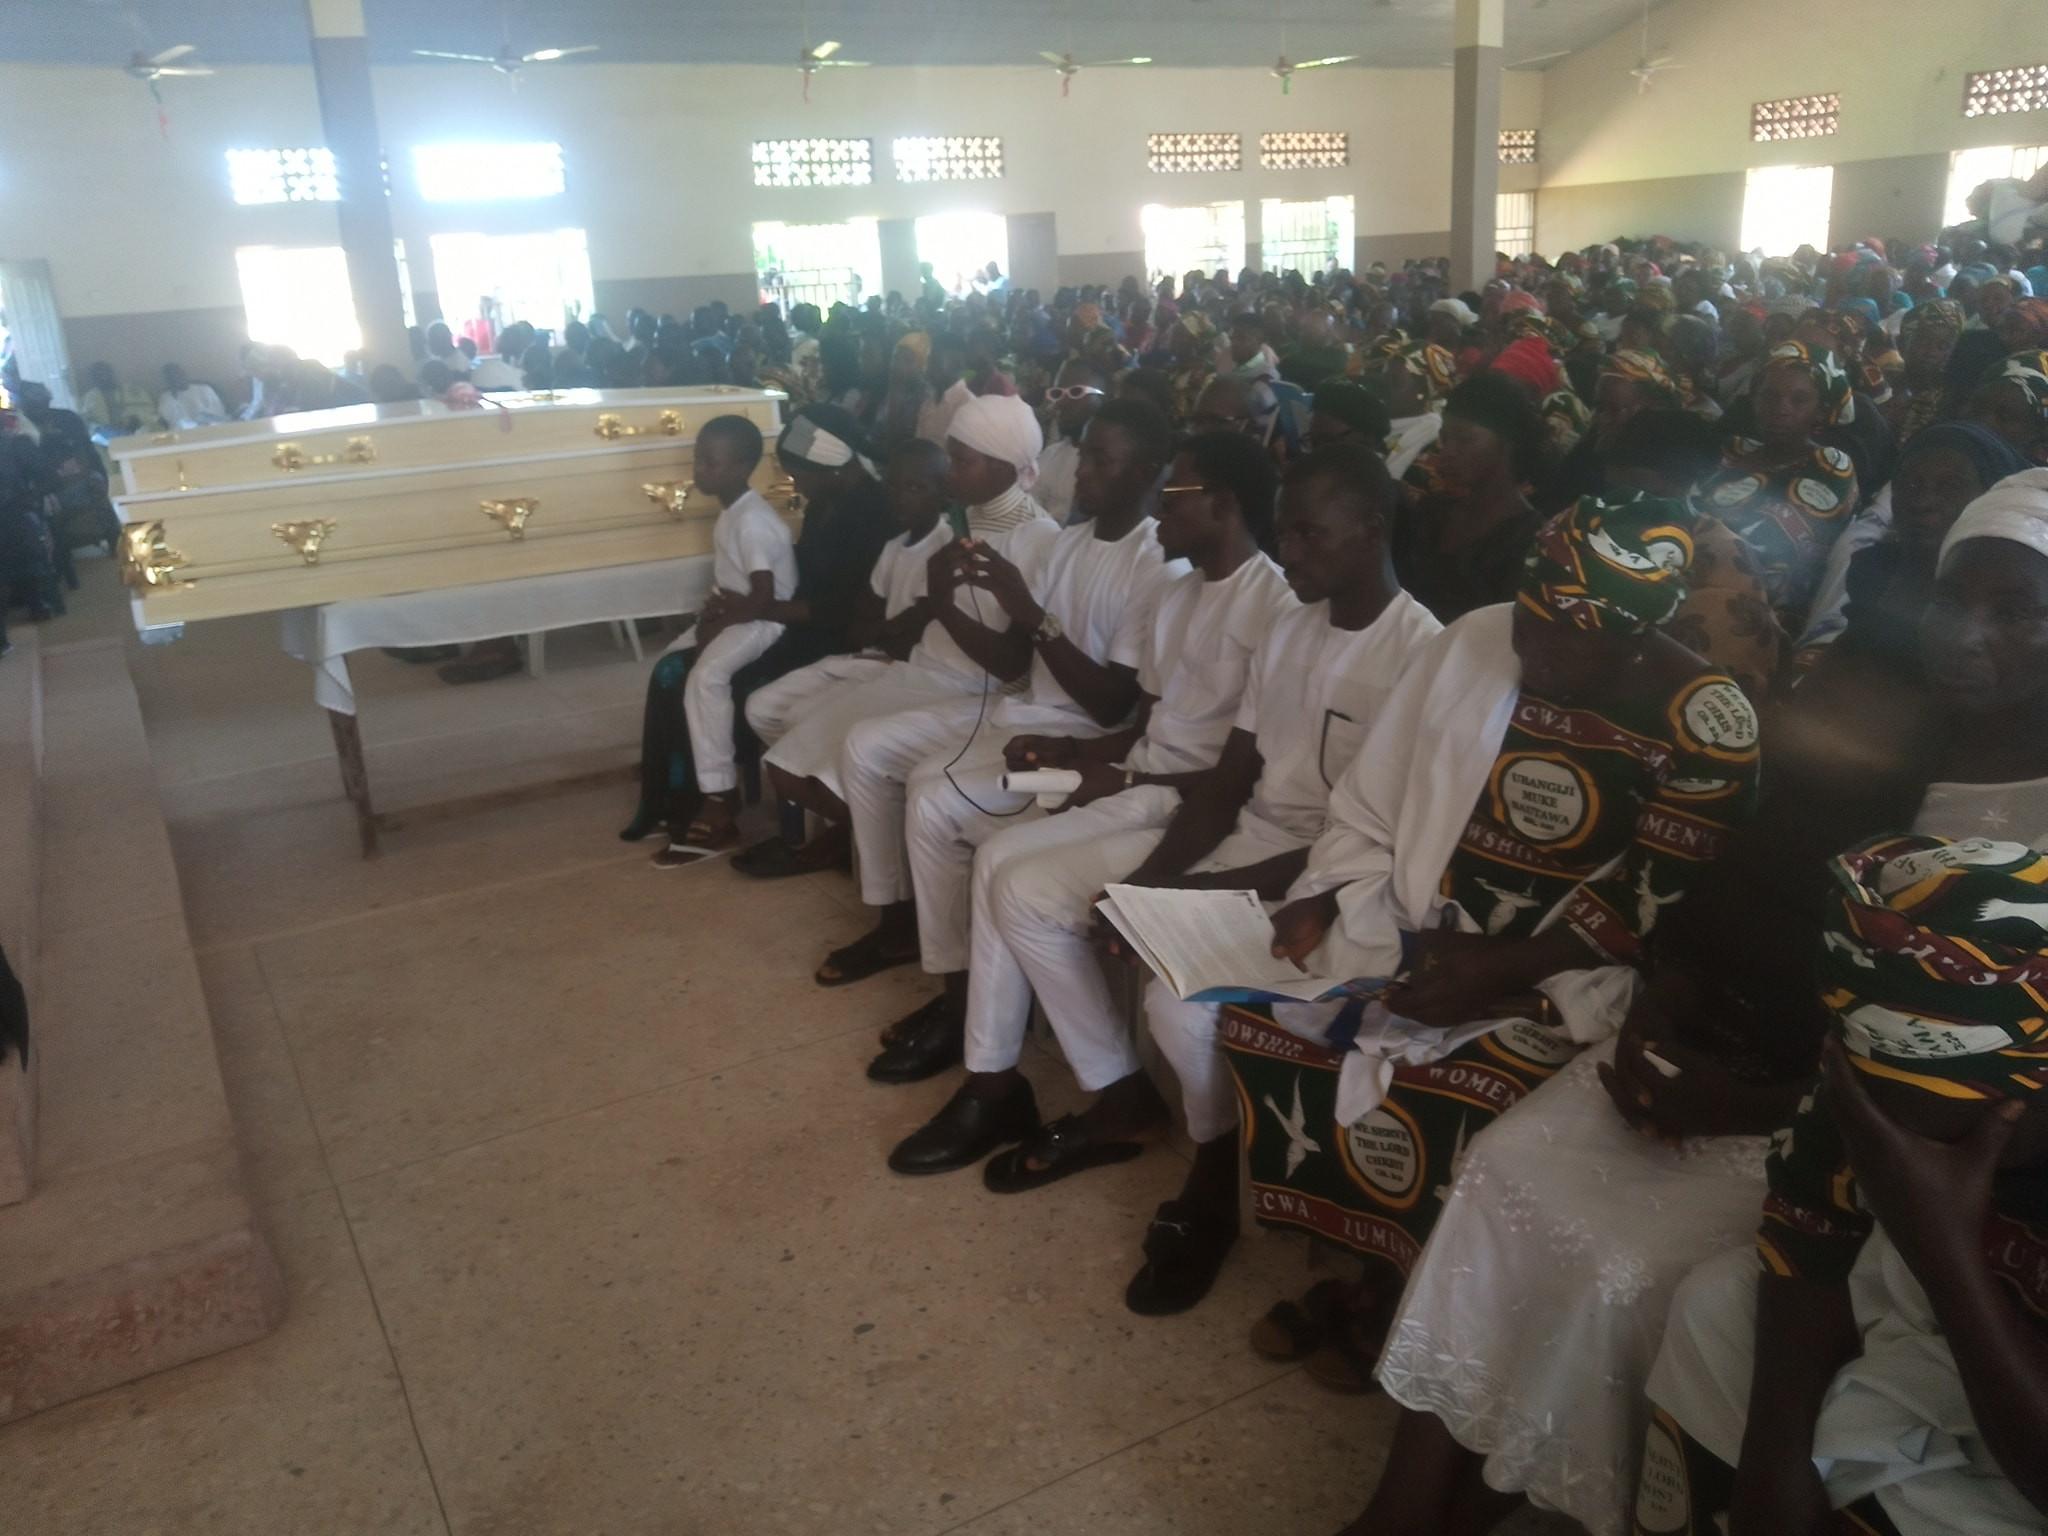 Update: Slain ECWA pastor laid to rest in Kaduna